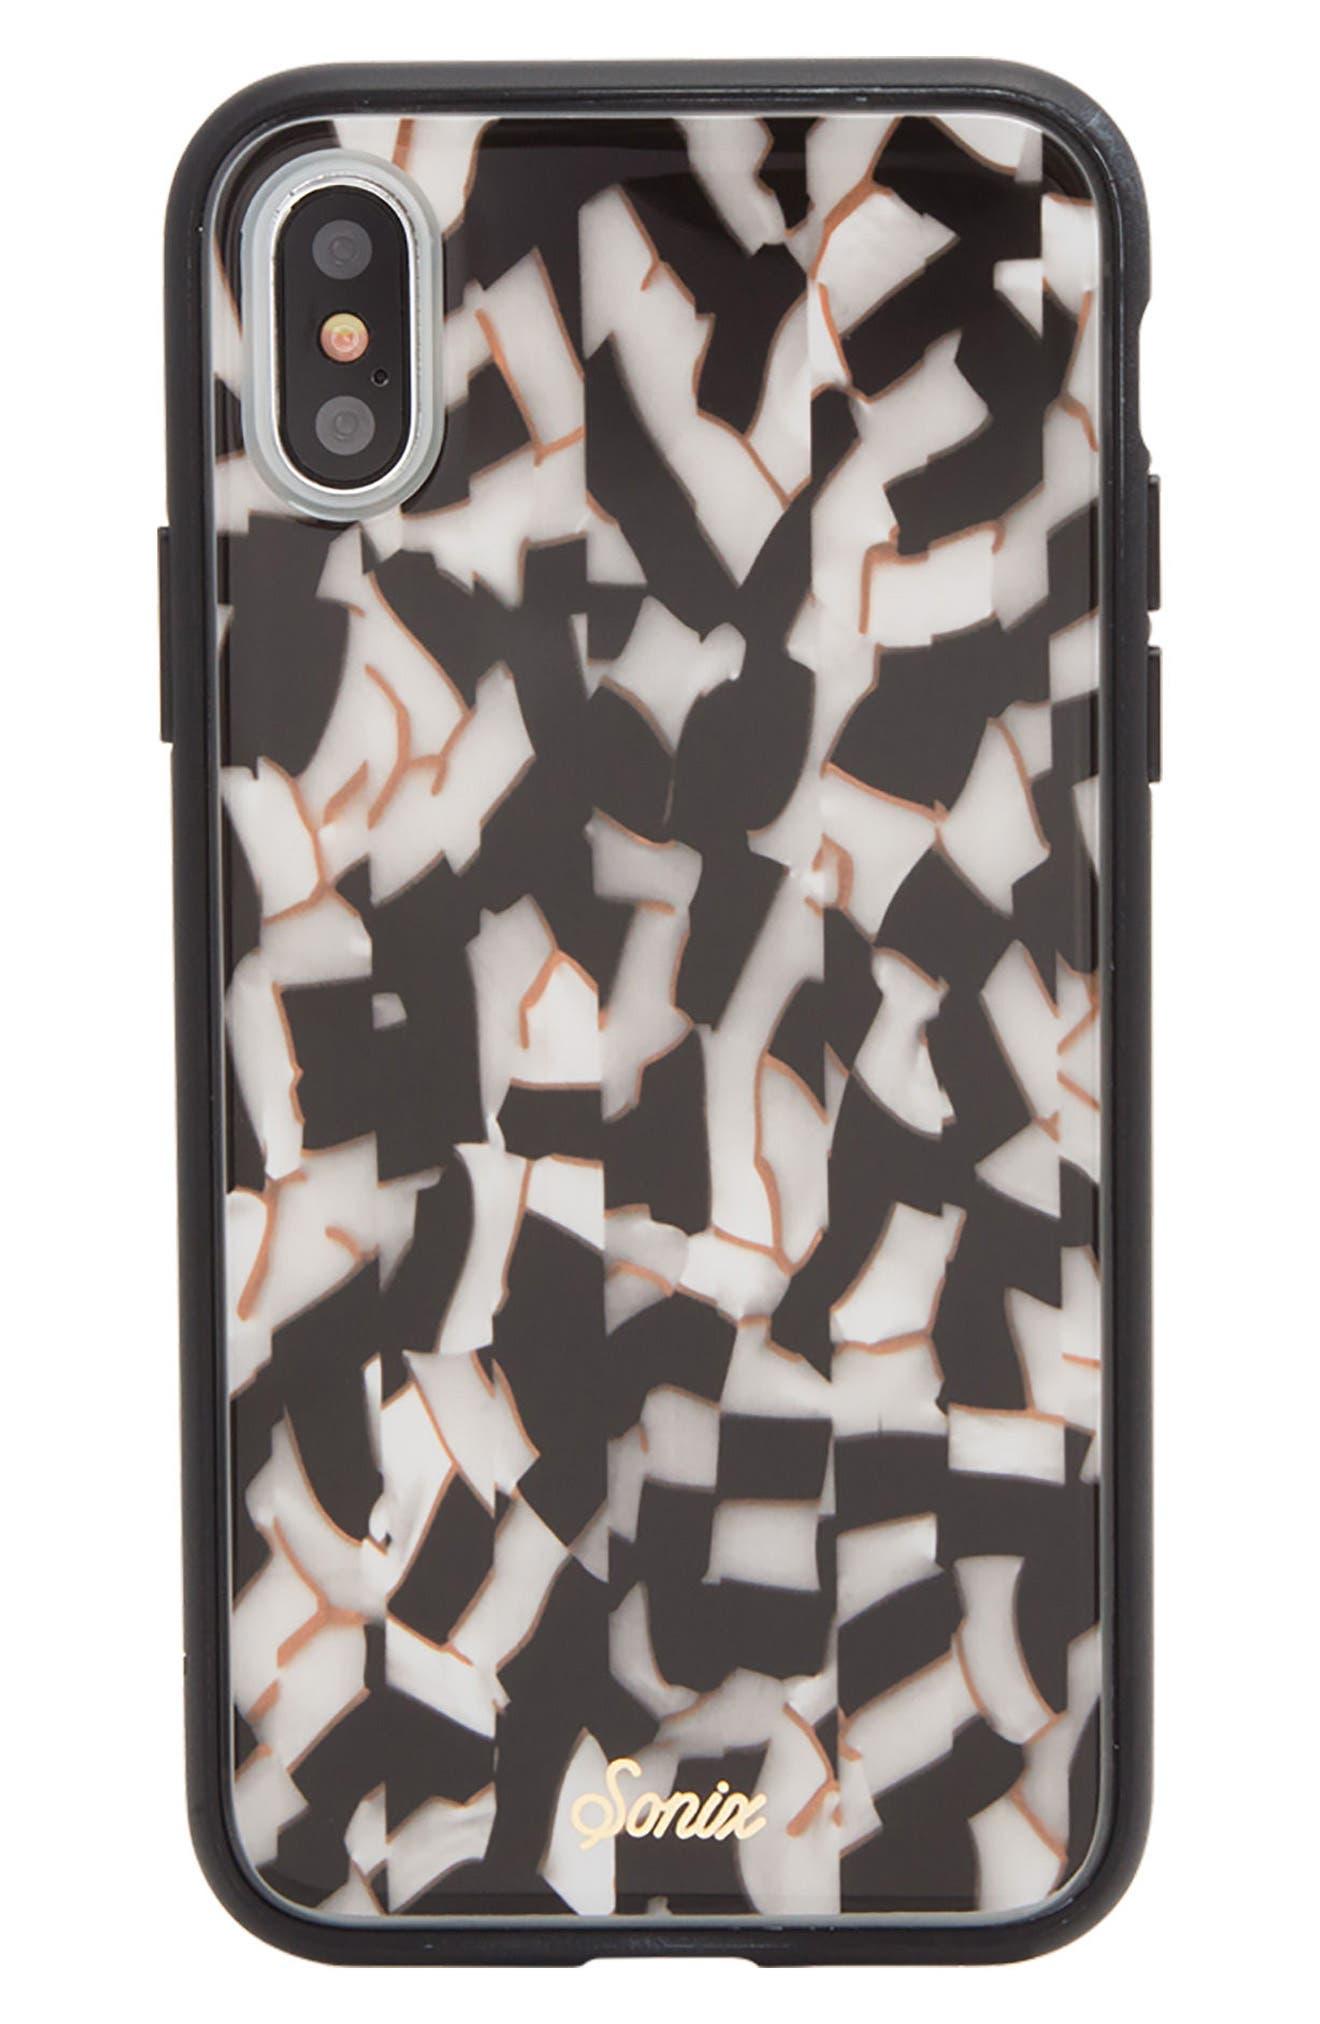 Sonix Pearlescent Black iPhone X Case